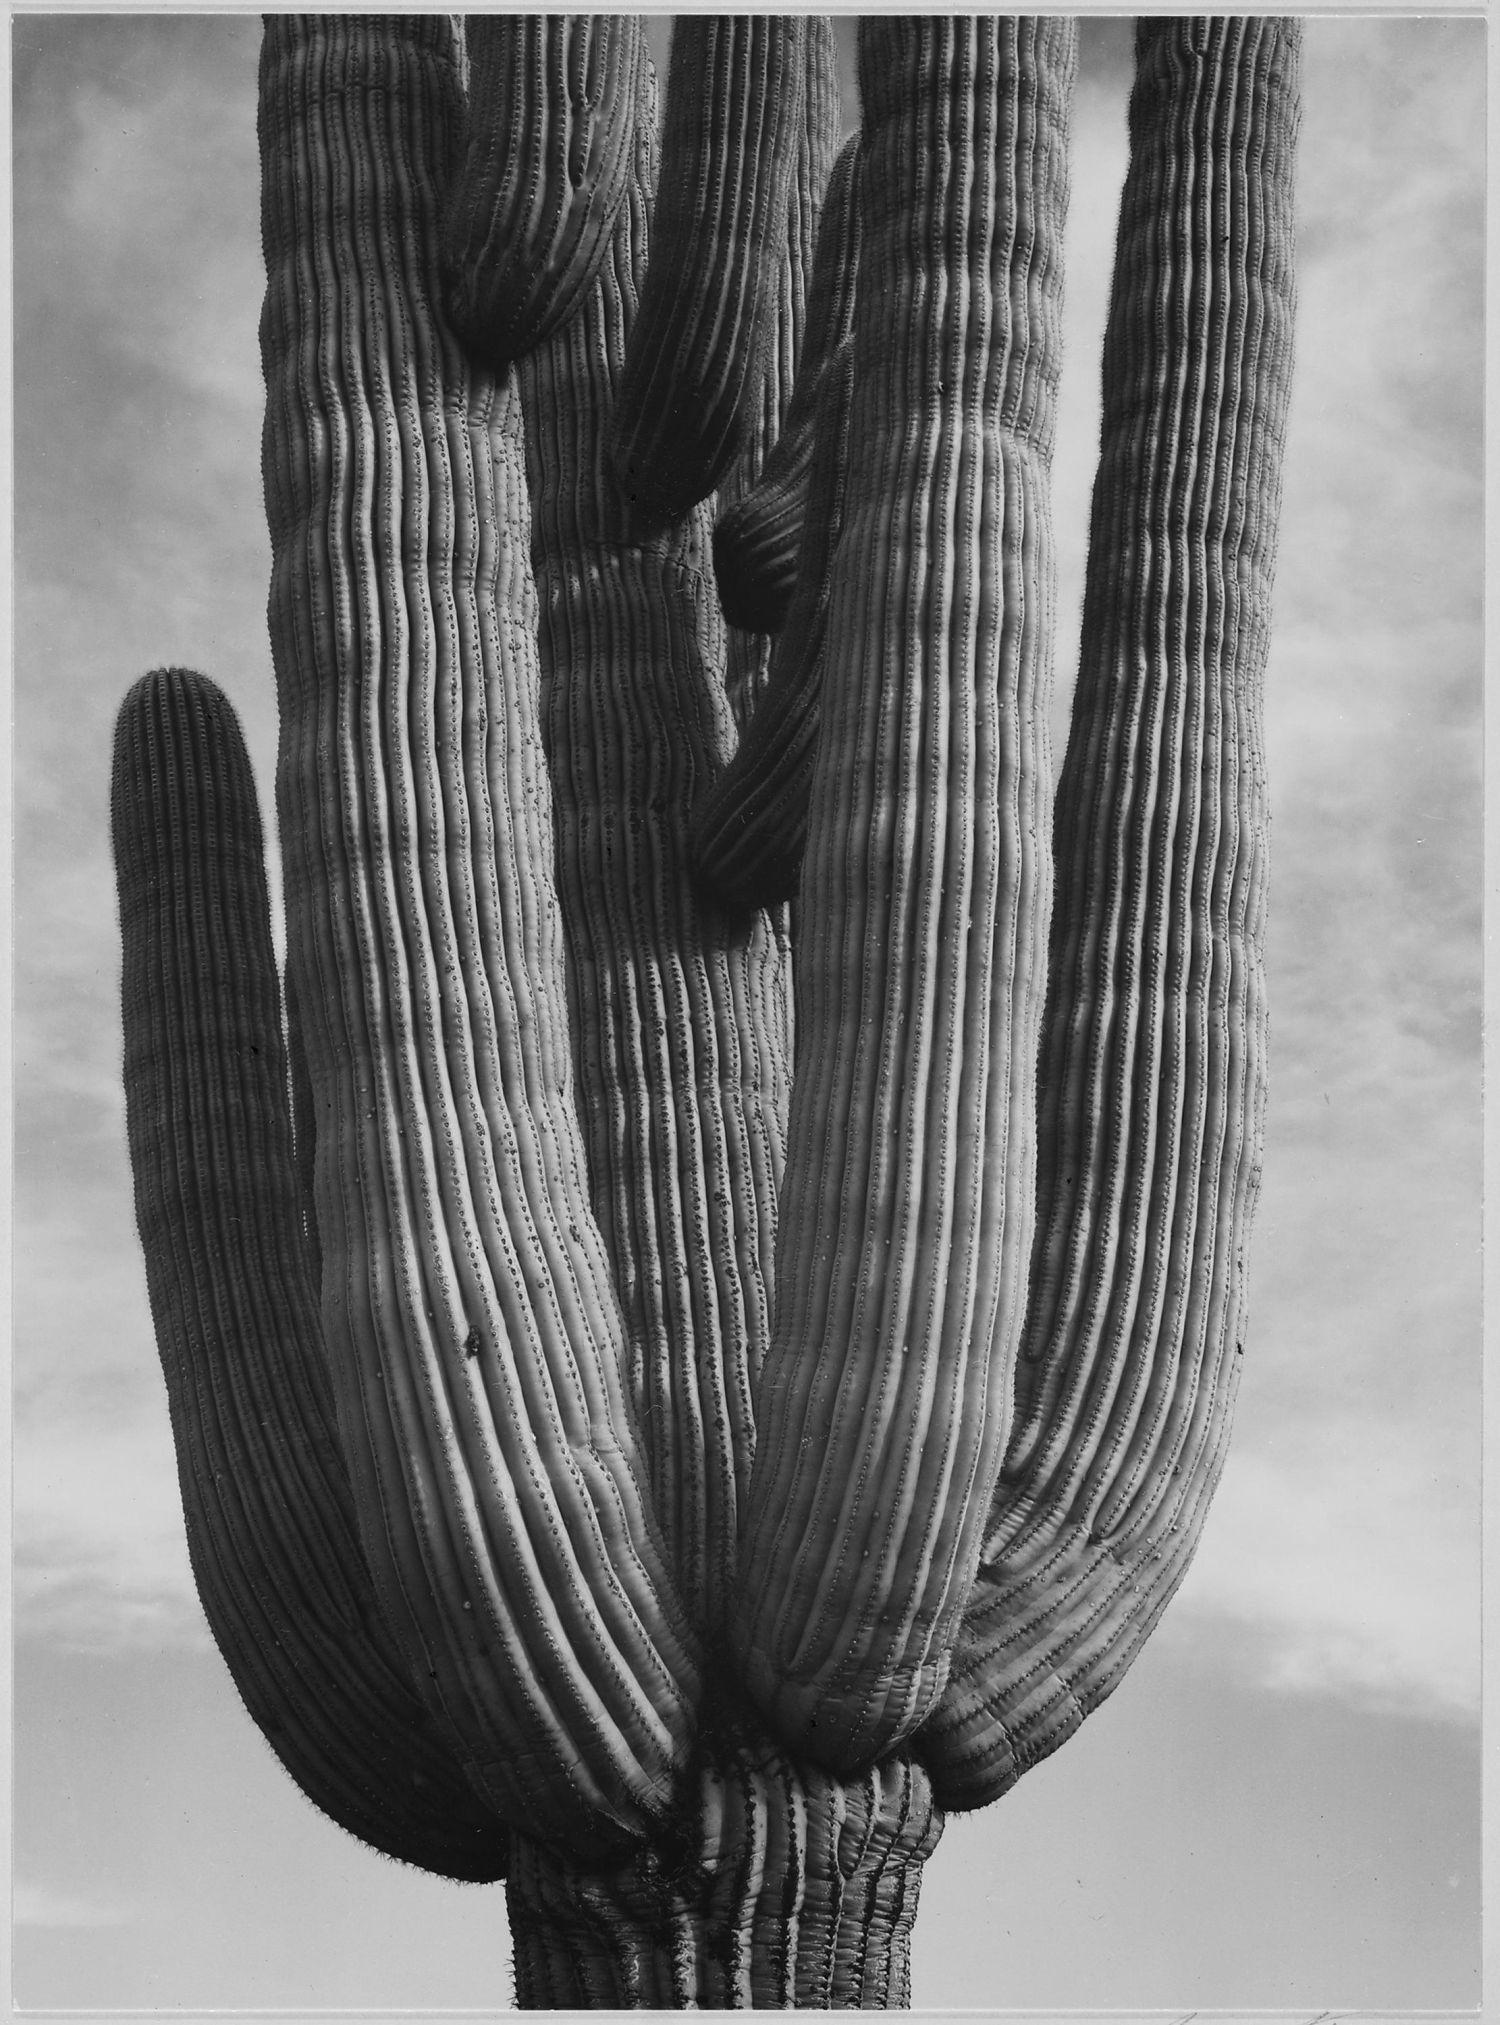 Cactus in Saguaro National Monument Arizona by Ansel Adams